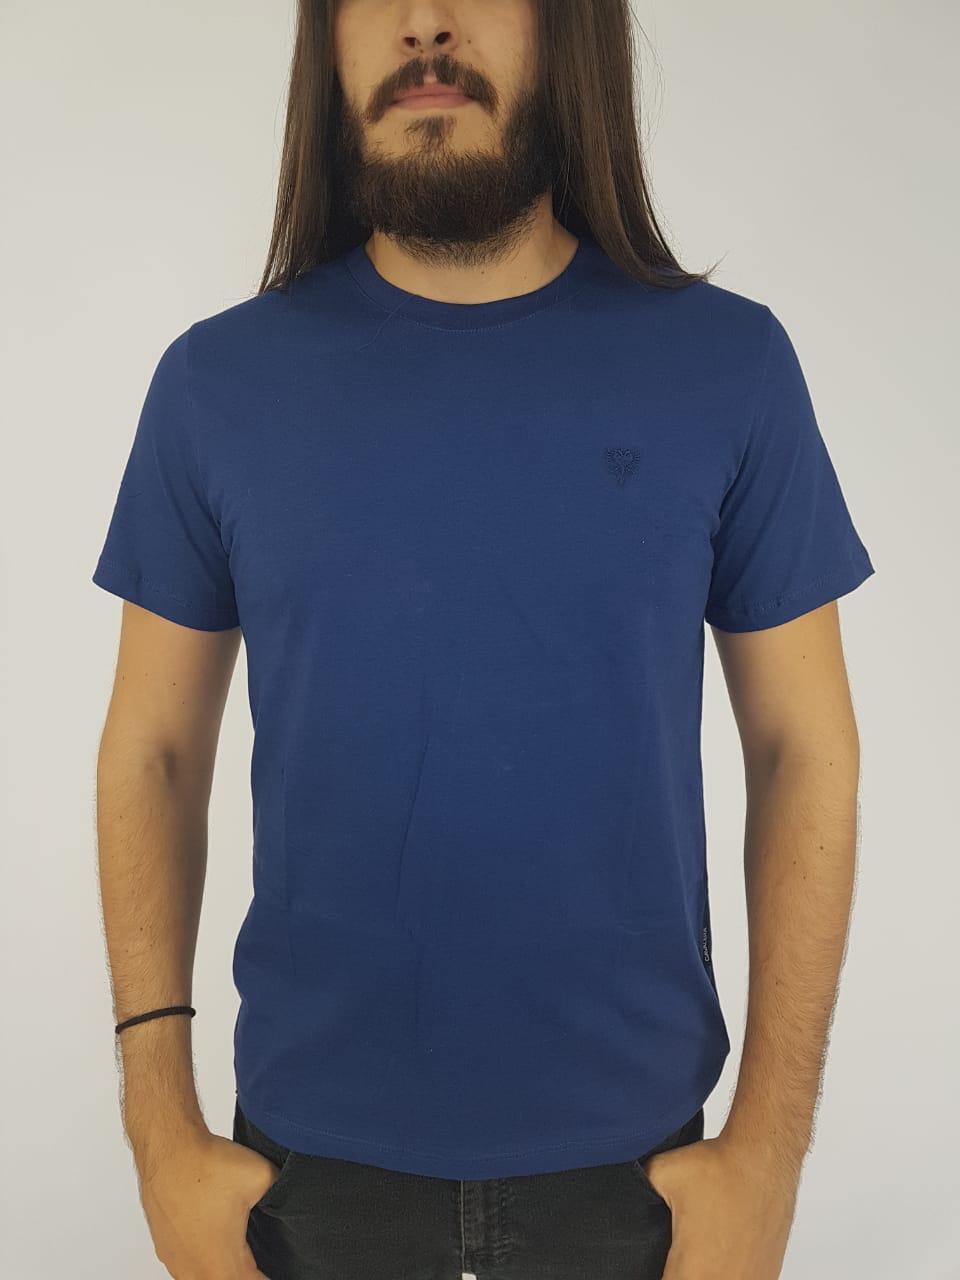 Camiseta Cavalera Masculina Manga Curta Básica 918a044a924